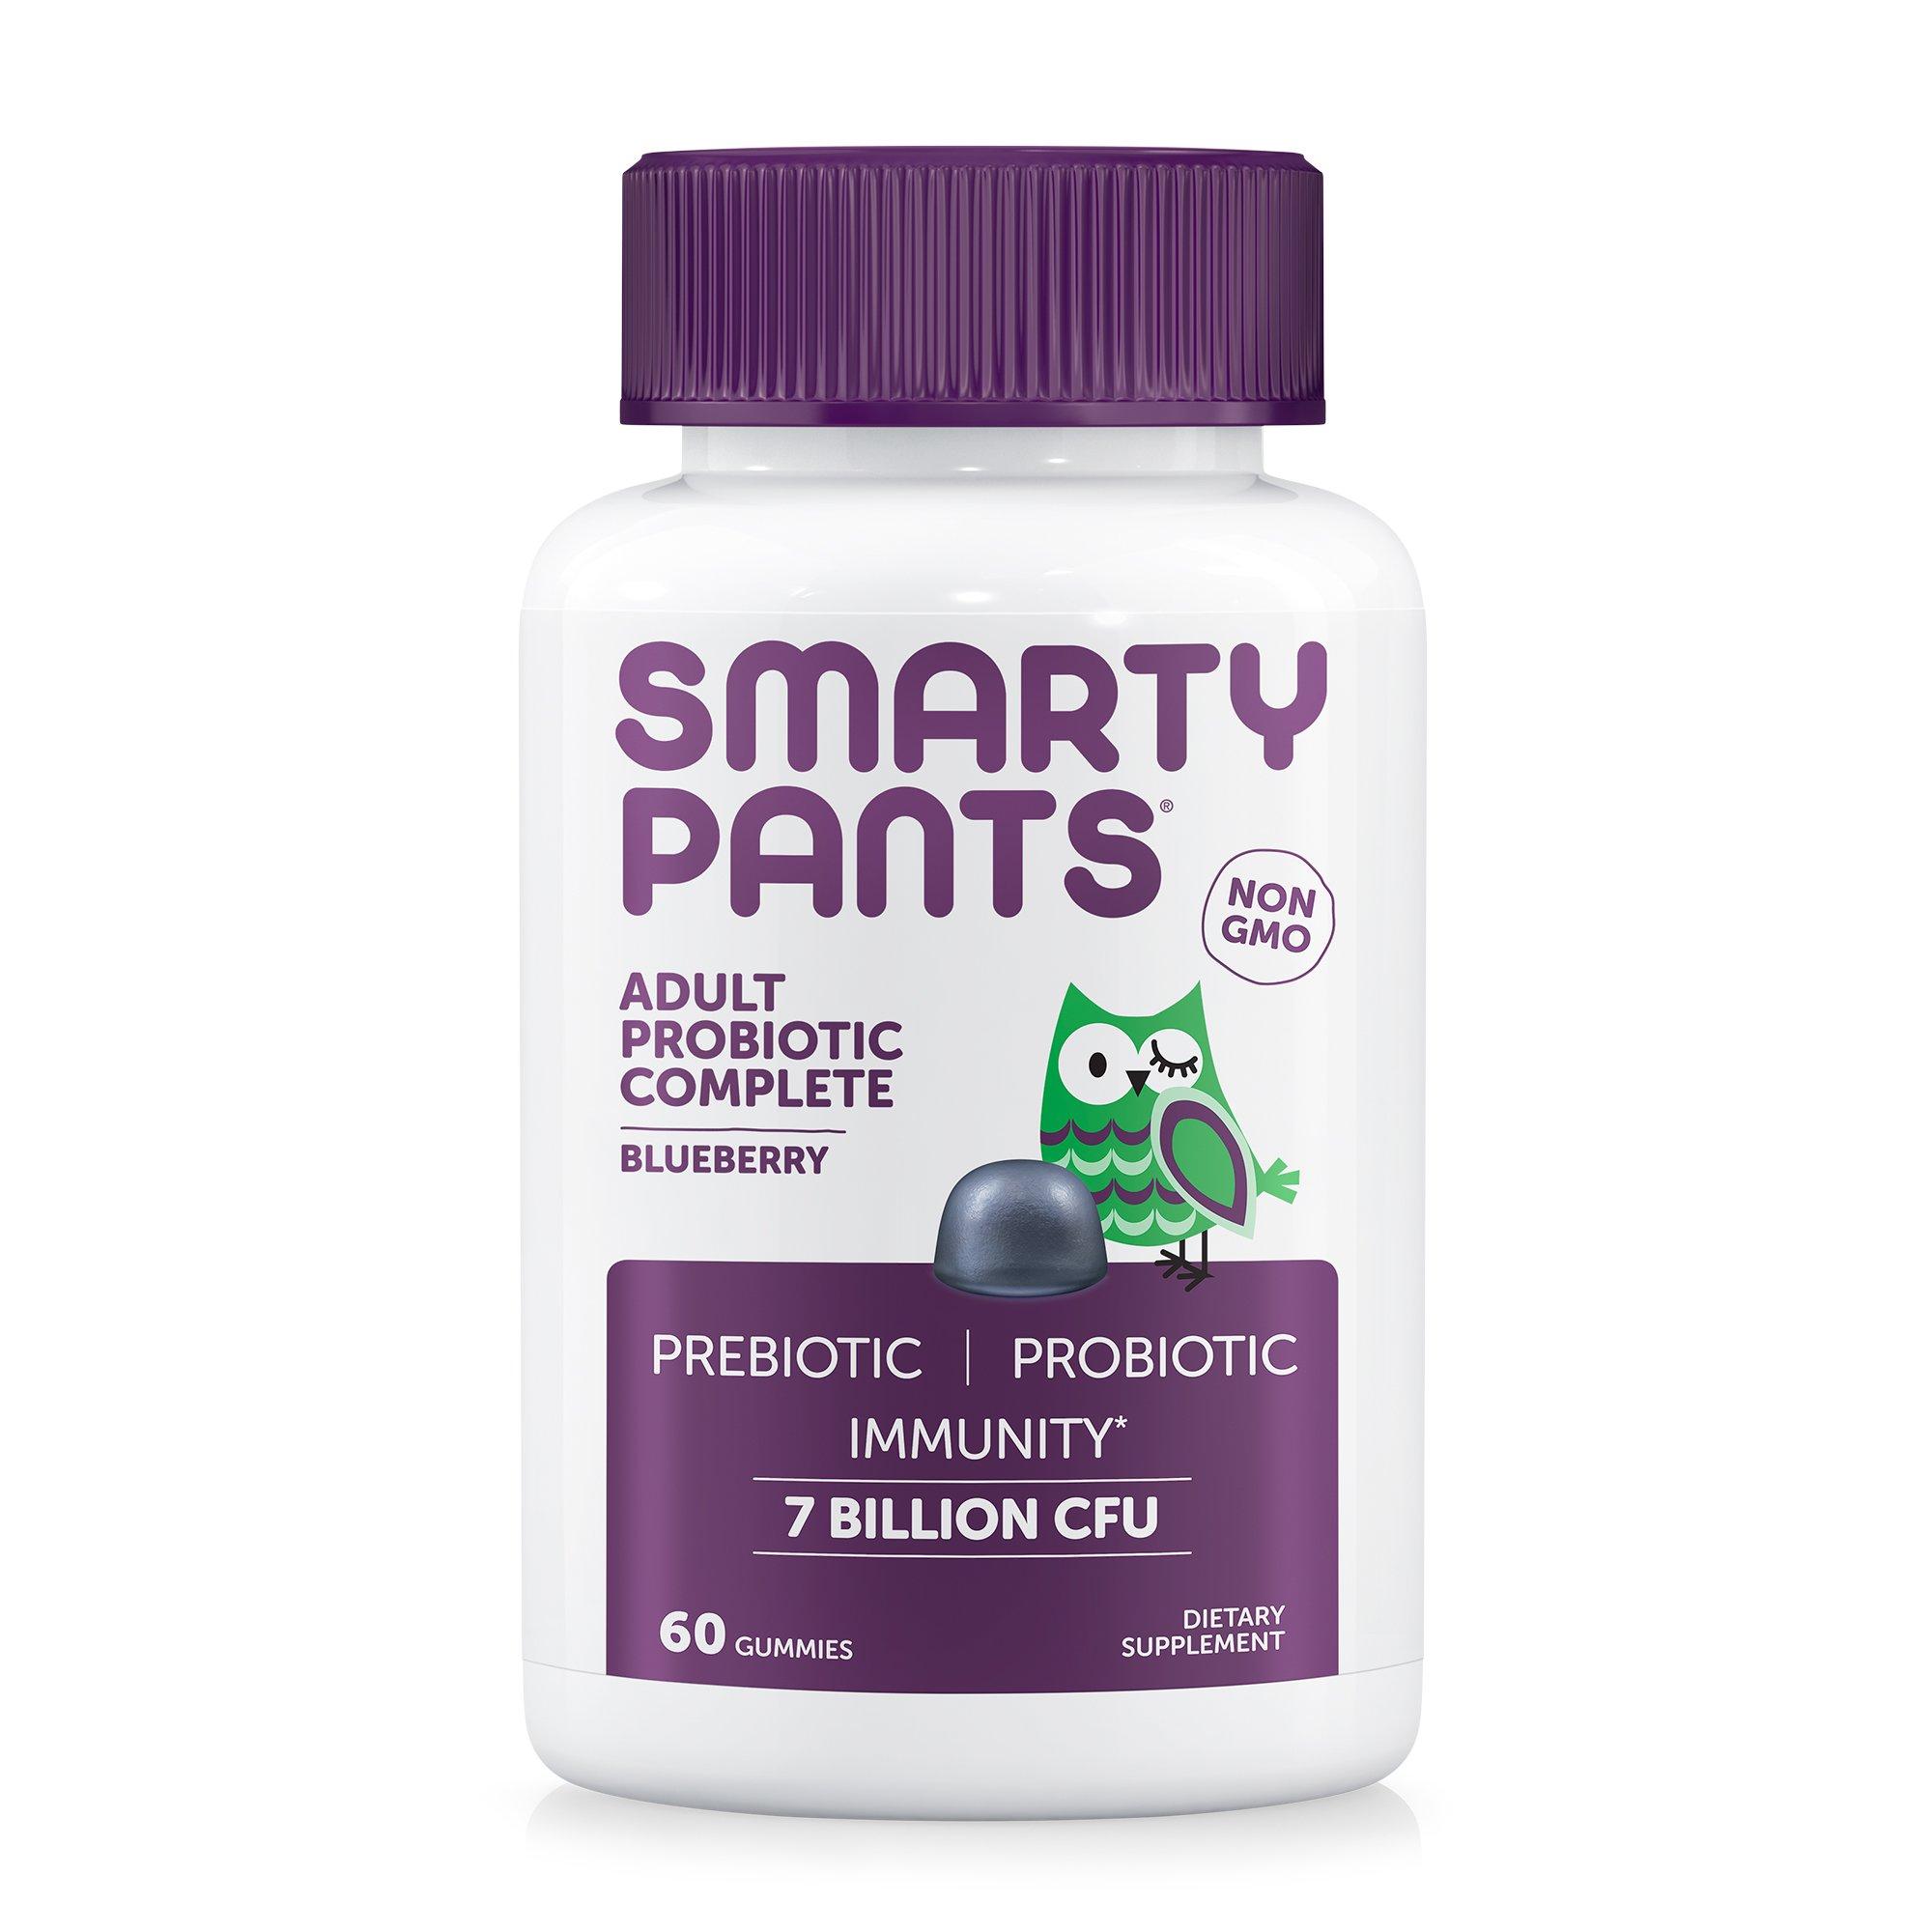 SmartyPants Adult Probiotic Complete; Probiotics & Prebiotics; Digestive & Immune Support* Gummies; 7 billion CFU, VEGAN, NON-GMO, NO REFRIGERATION REQUIRED, Blueberry Flavor, 60 Count, 30 Day Supply